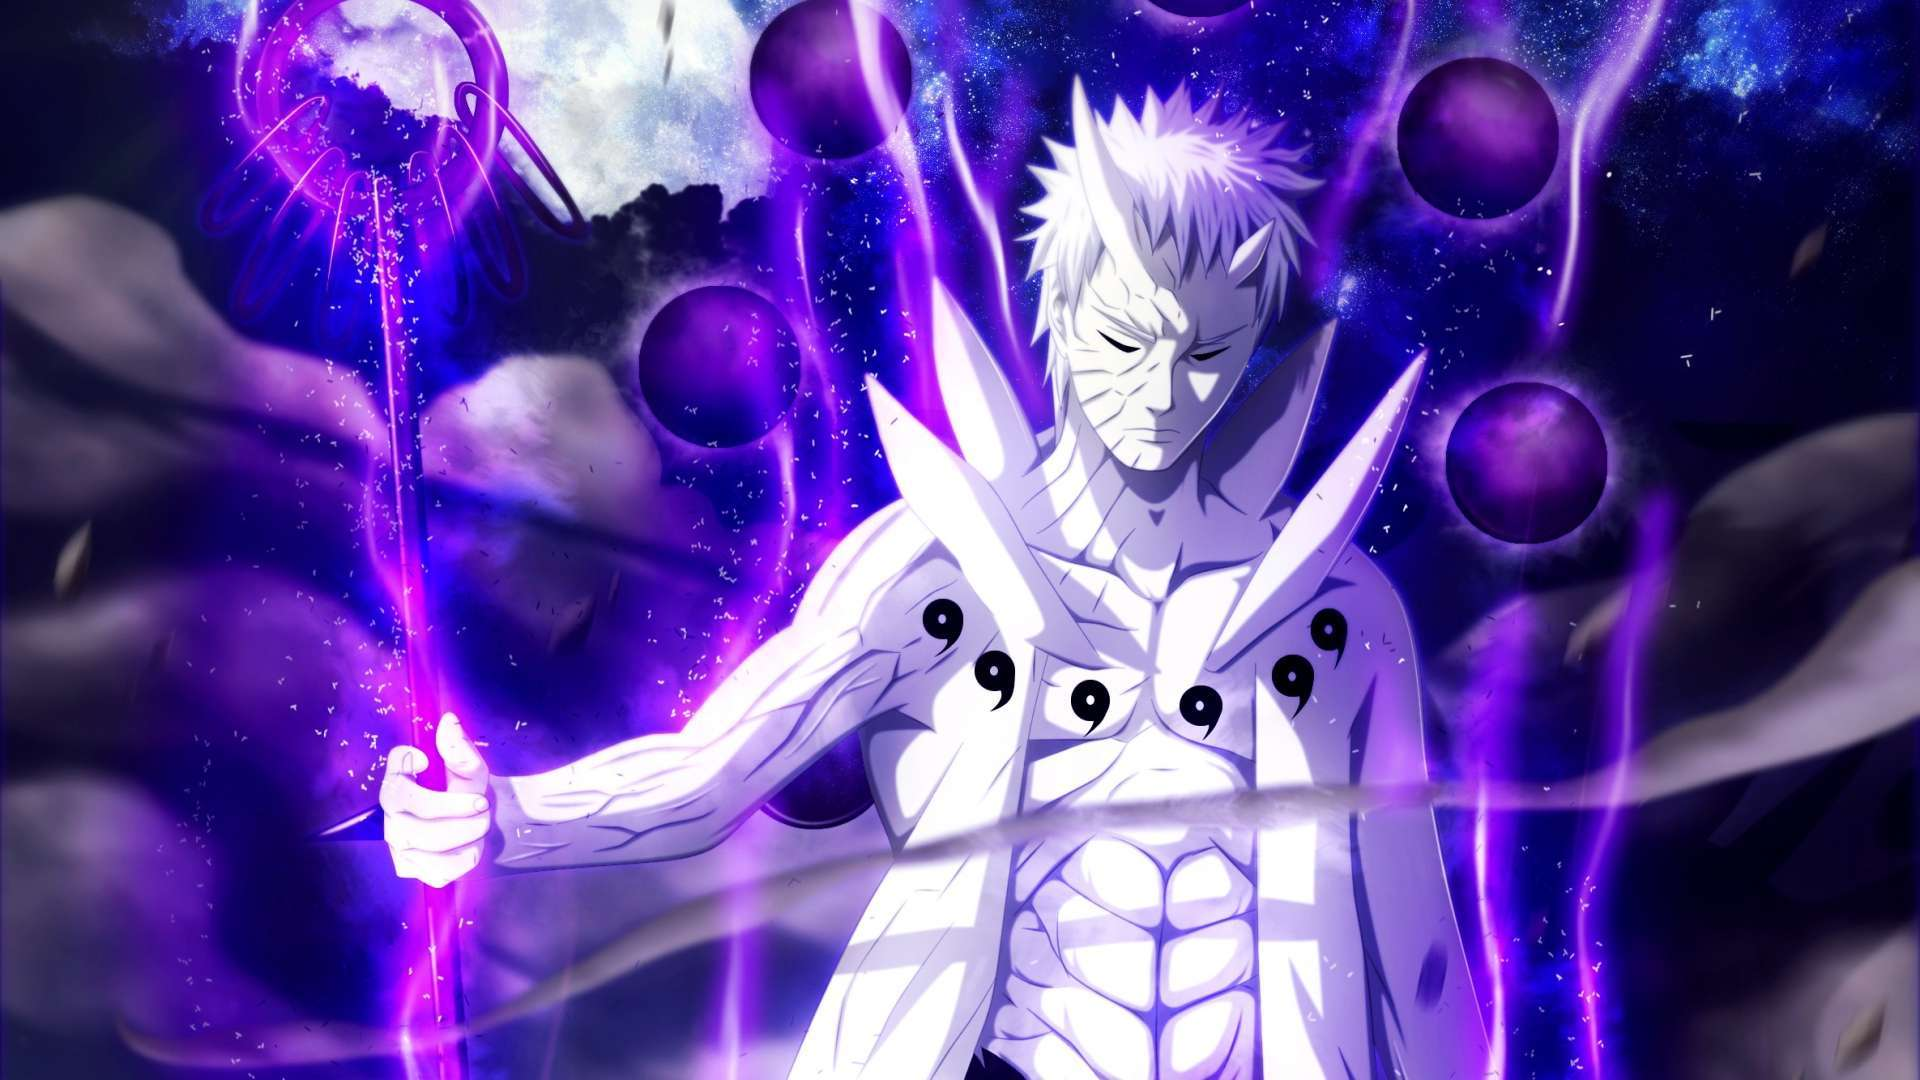 1080p Anime Wallpaper Download Free Best Anime Wallpaper